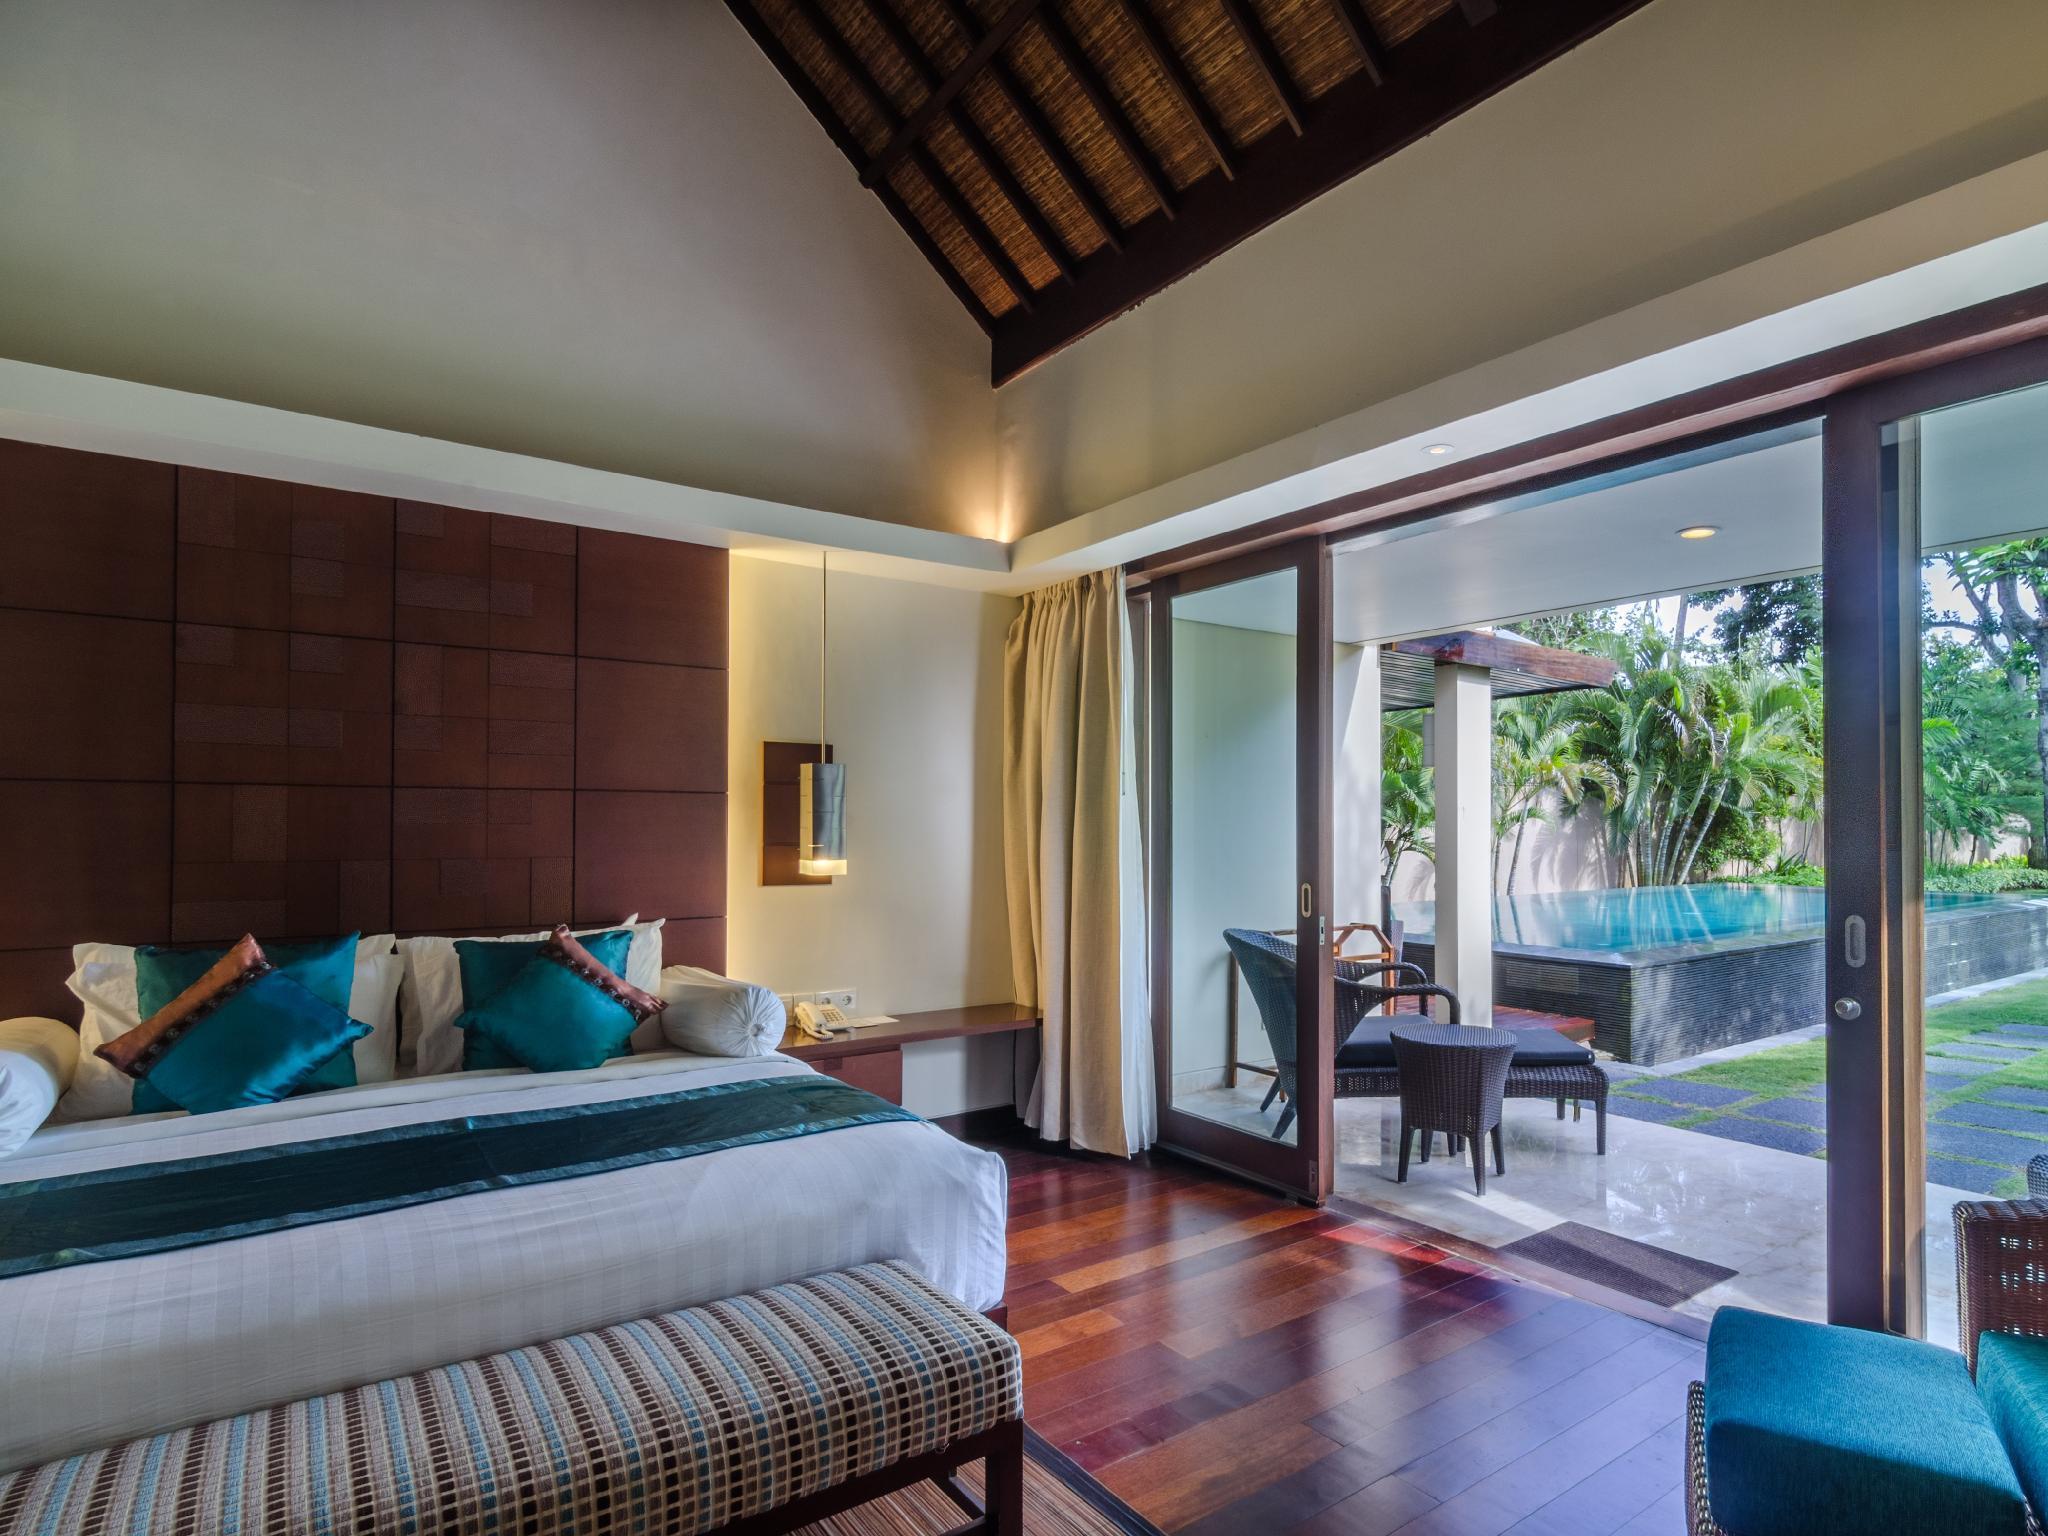 Prama Sanur Beach Bali Hotel Resort Deals Photos Reviews